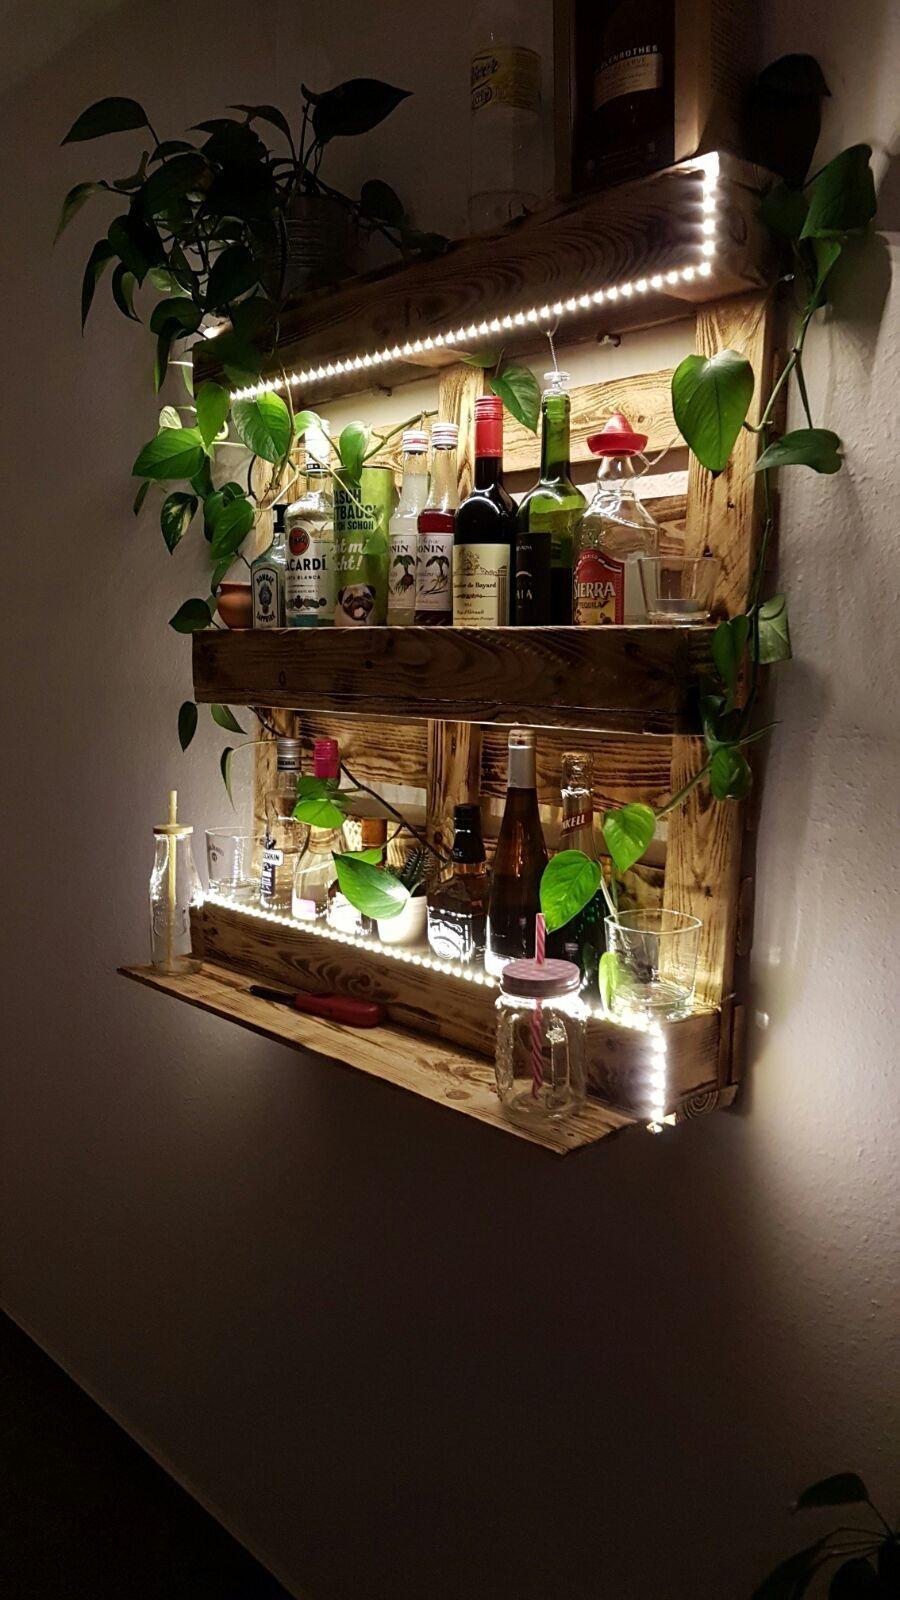 Palettenregal Bar Aus Paletten Mit Led Beleuchtung Holz Diy Paletten Regal In 2020 Diy Pallet Projects Pallet Diy Wood Diy